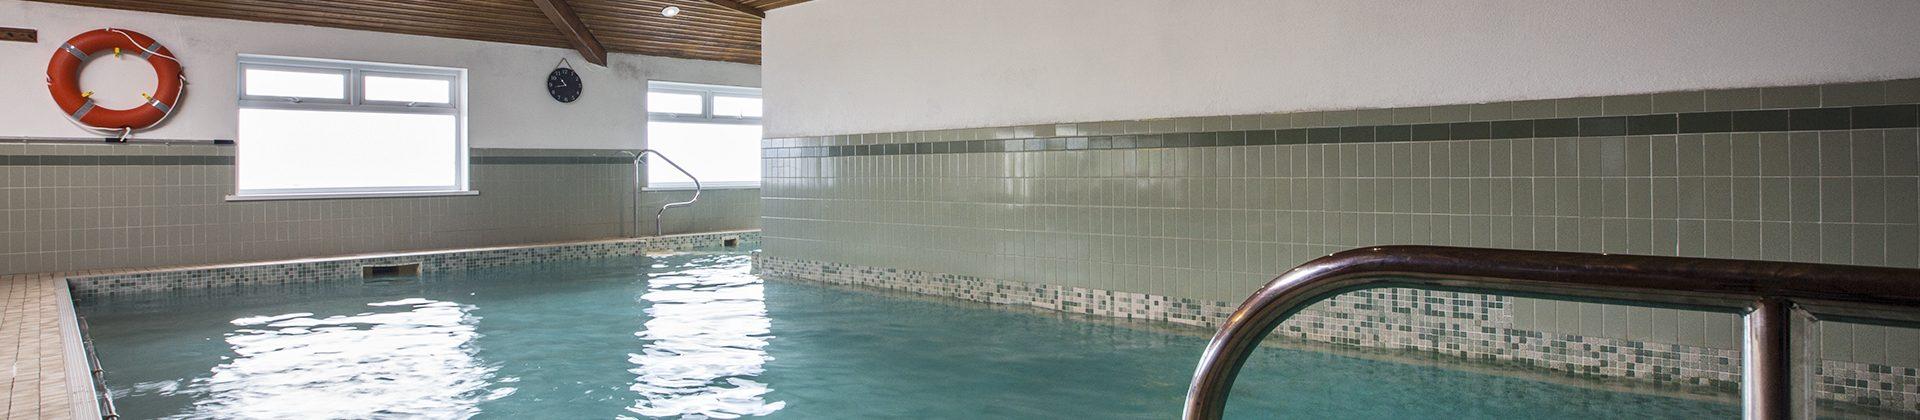 The Garrack Hotel - Swimming Pool